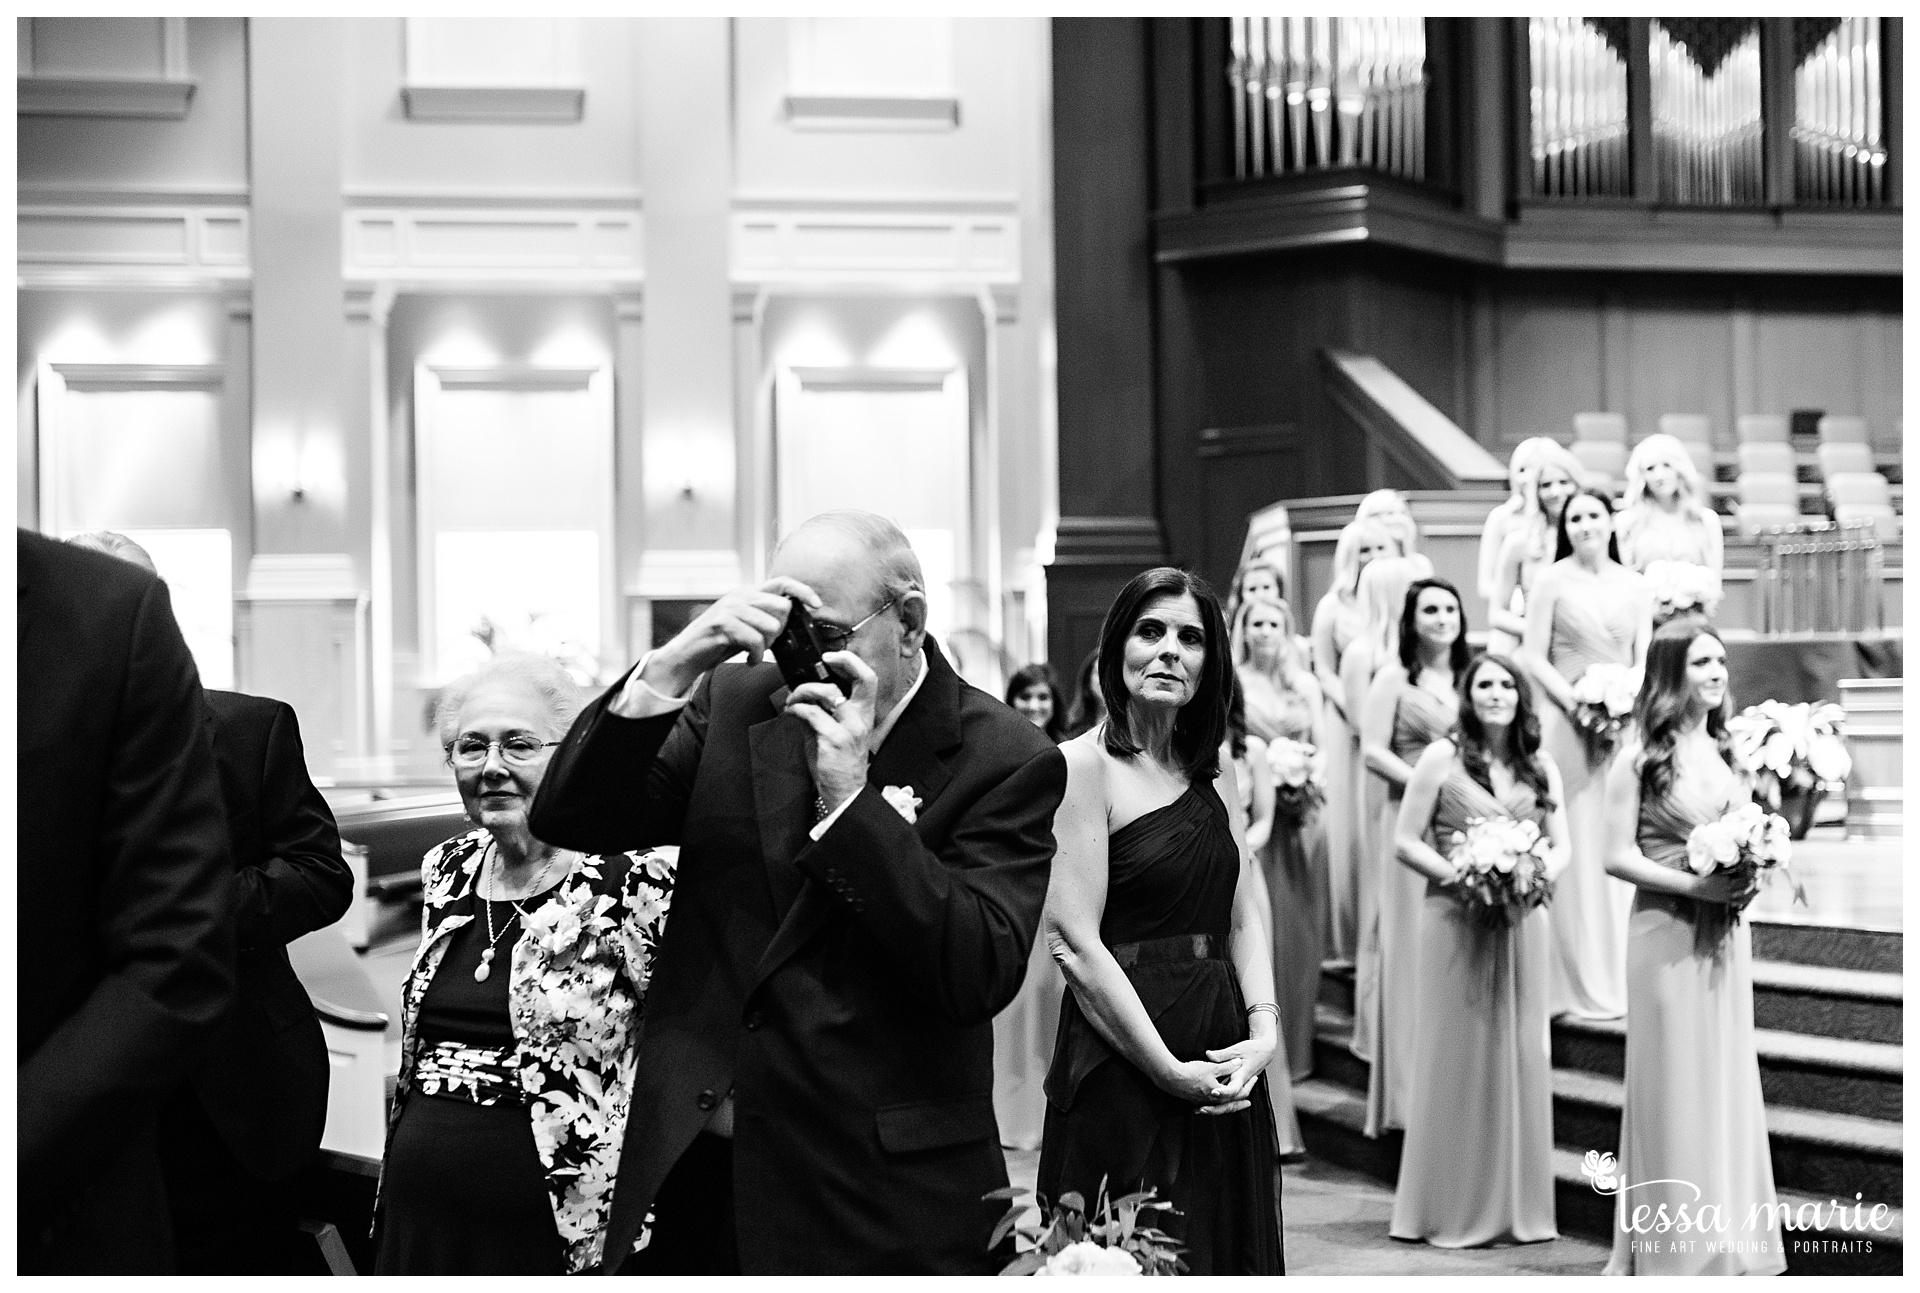 tessa_marie_weddings_legacy_story_focused_wedding_pictures_atlanta_wedding_photographer_0110